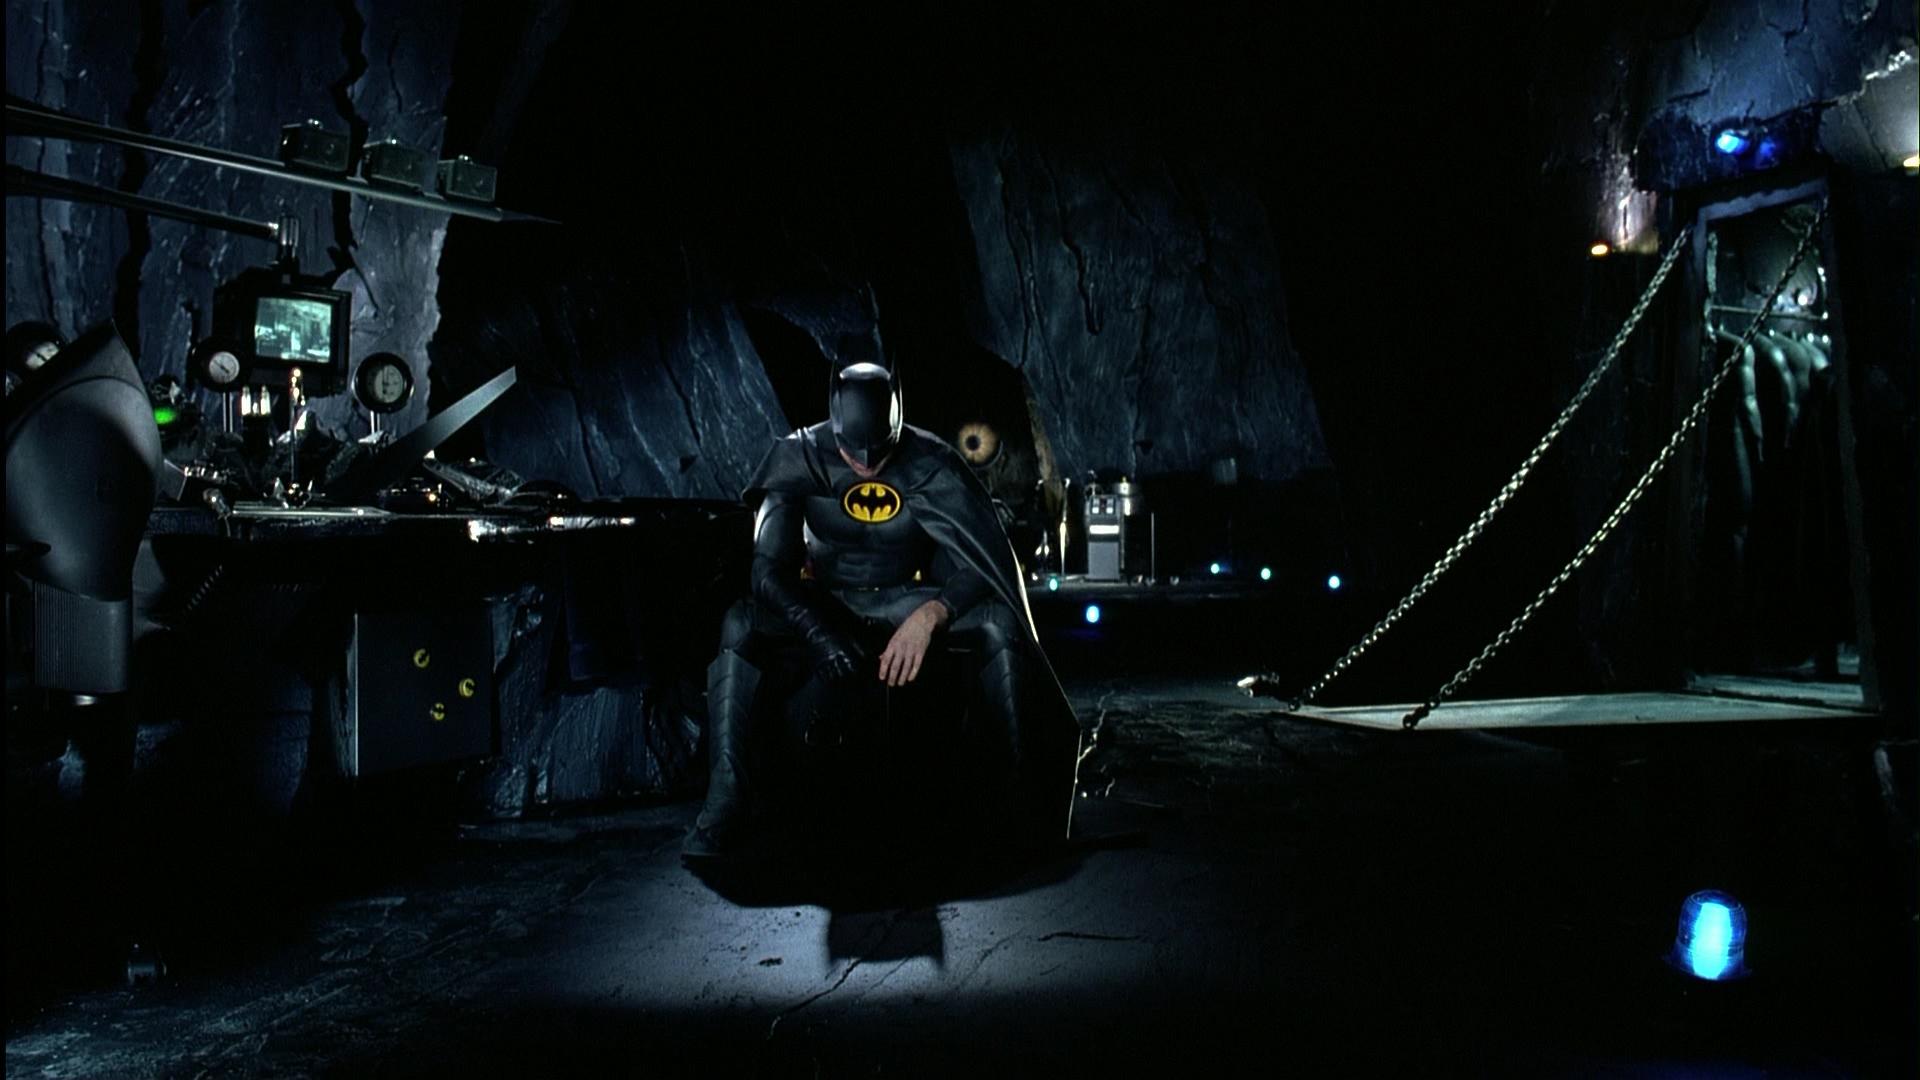 arkham skin pc download 1966 batmobile batman knight